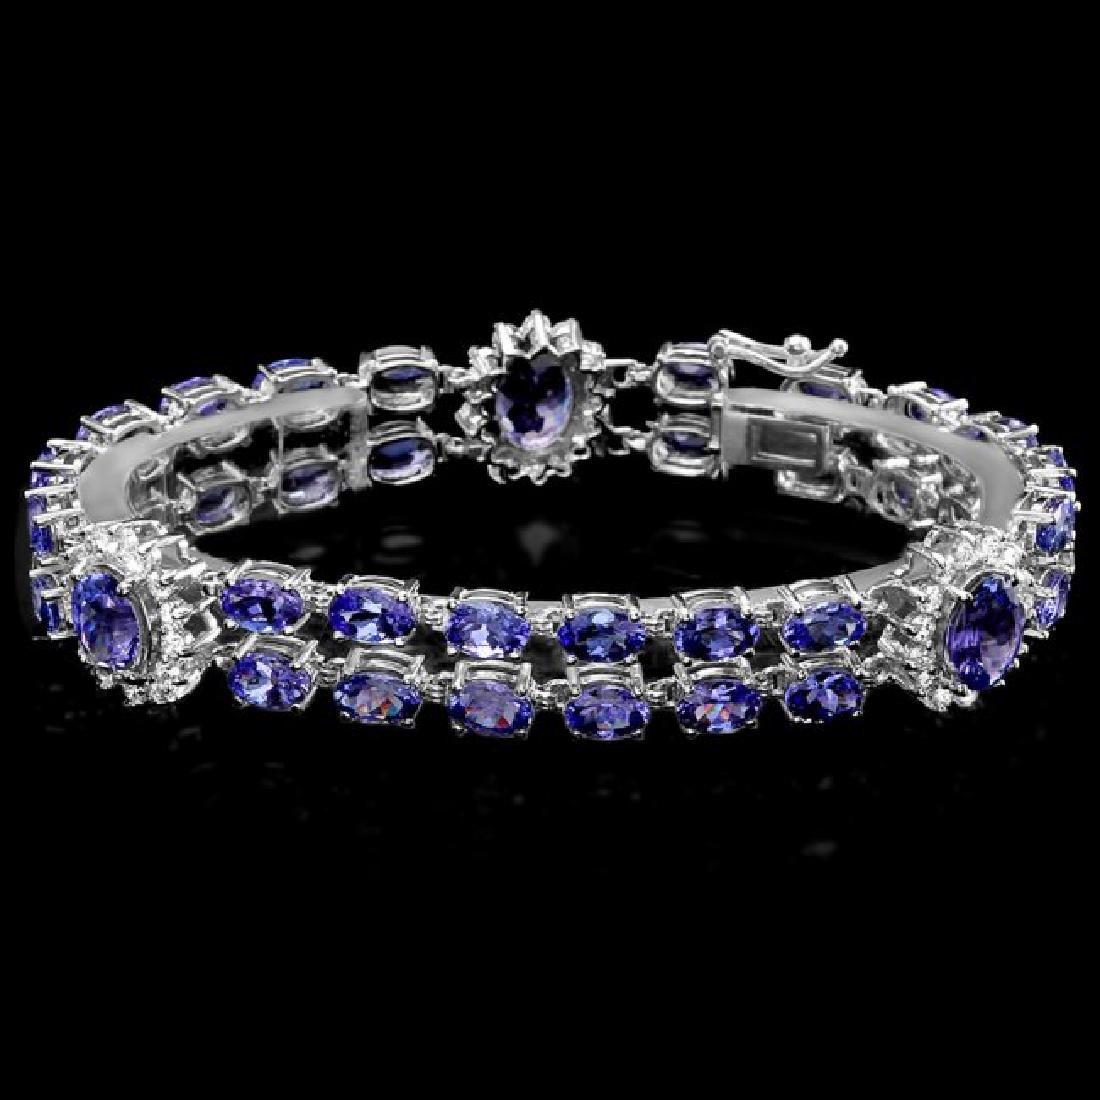 14k 21.88ct Tanzanite 1.66ct Diamond Bracelet - 2